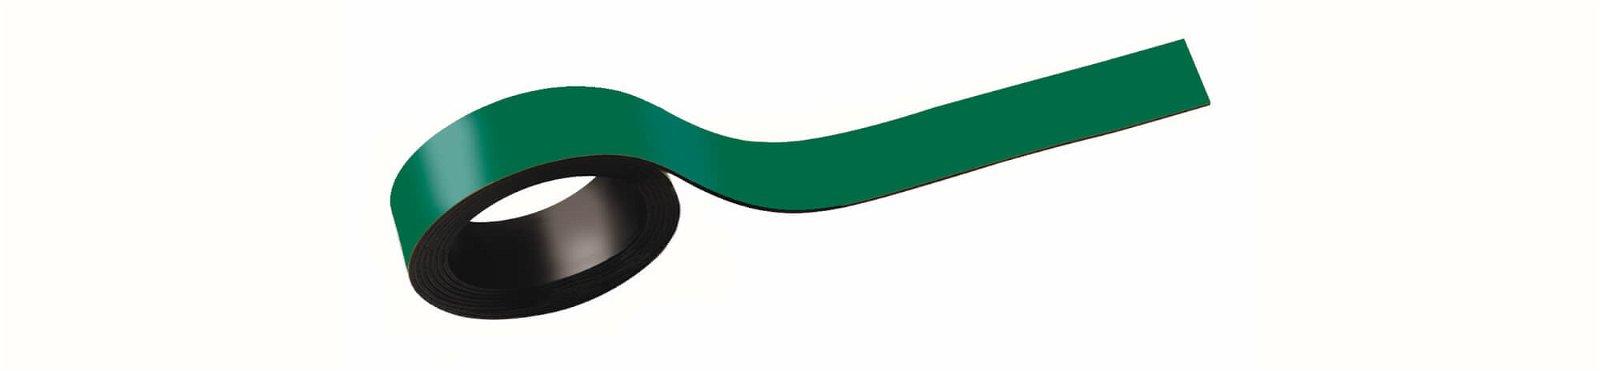 Magnetstreifen, 2x100 cm, 2 St./Set, grün